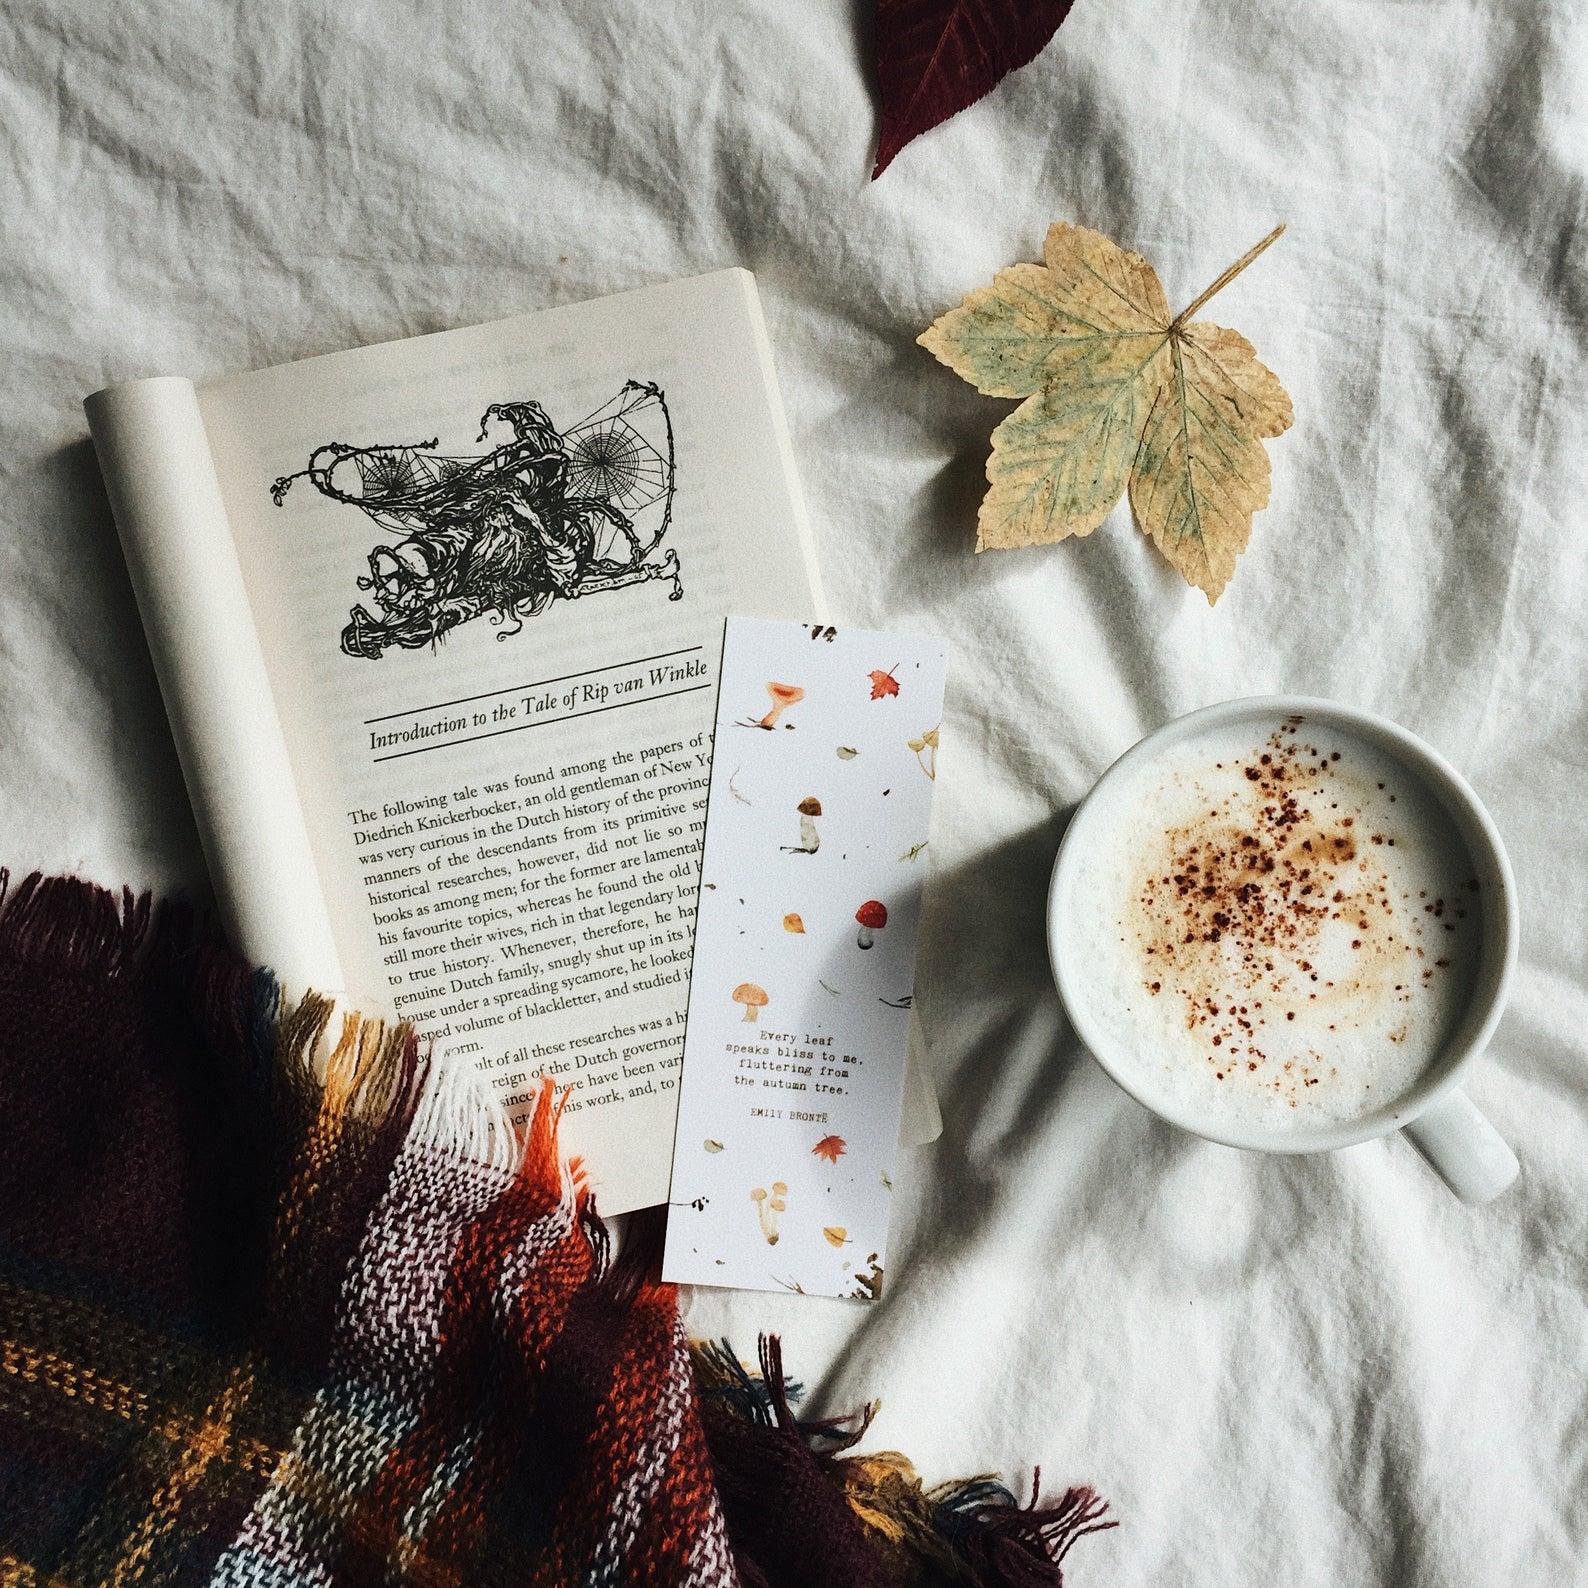 Emily Brontë Autumn Bookmark By White Saturday Co.